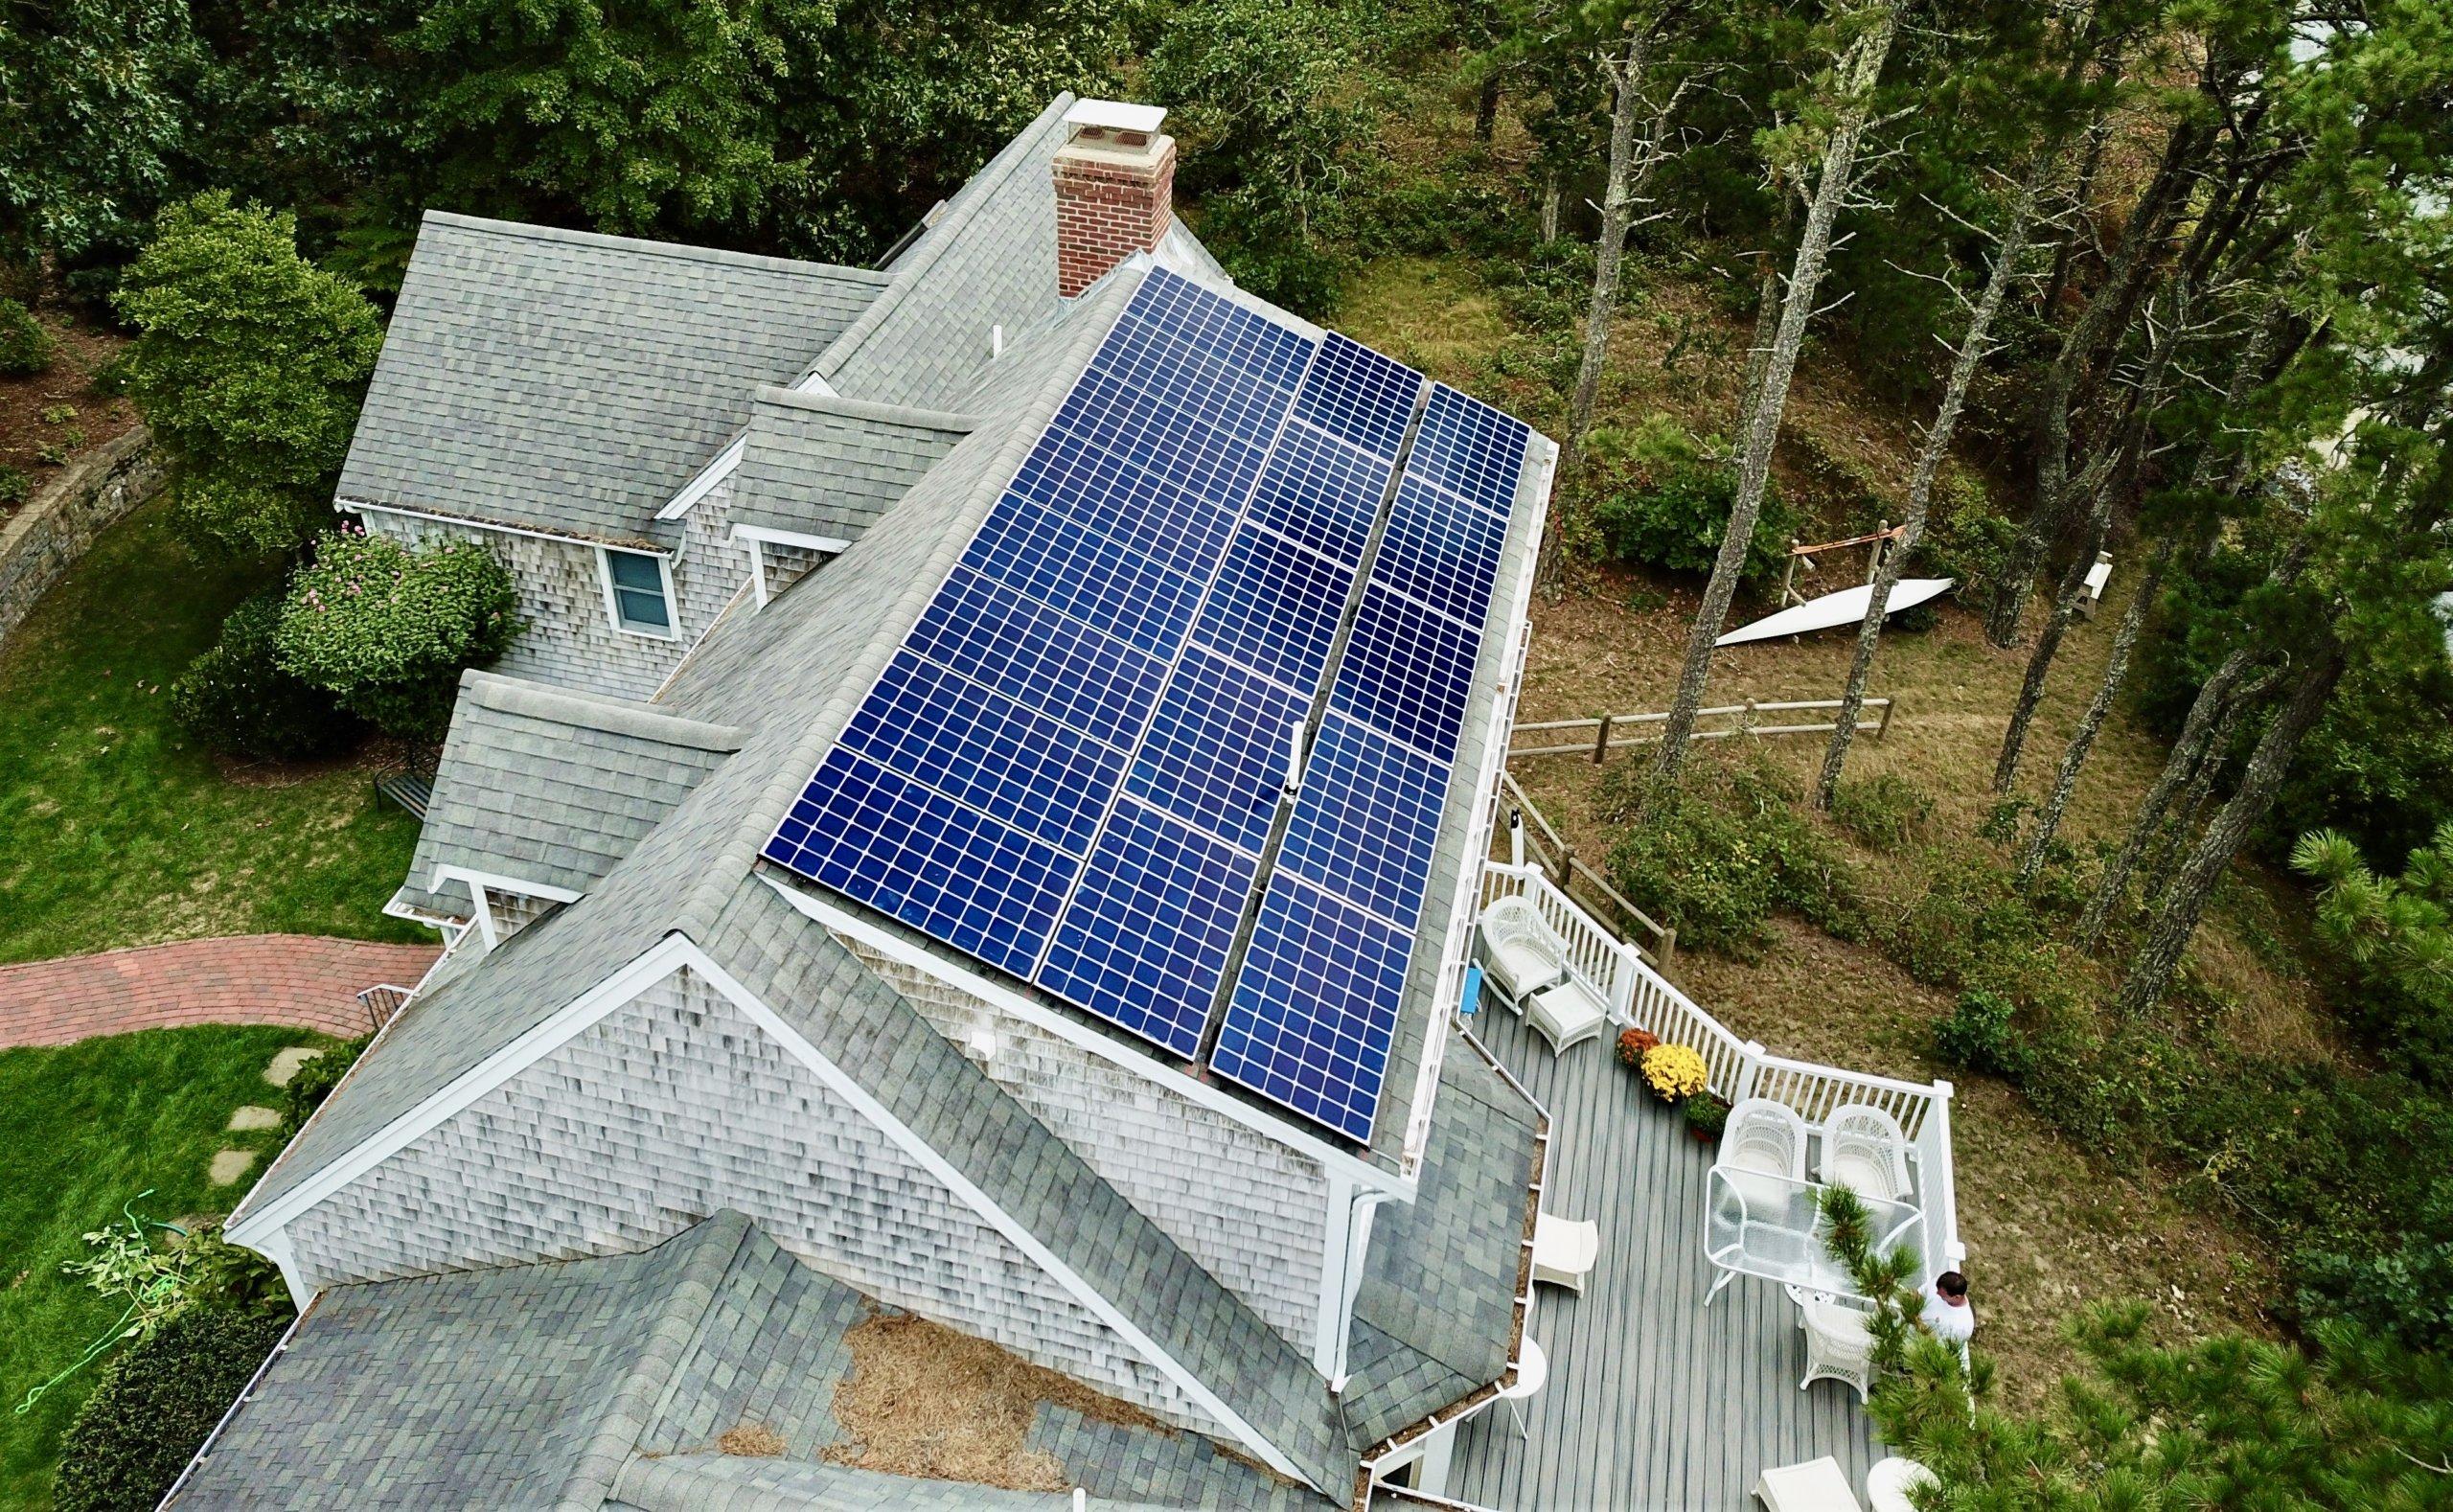 brewster cape cod residential solar installation by my generation energy